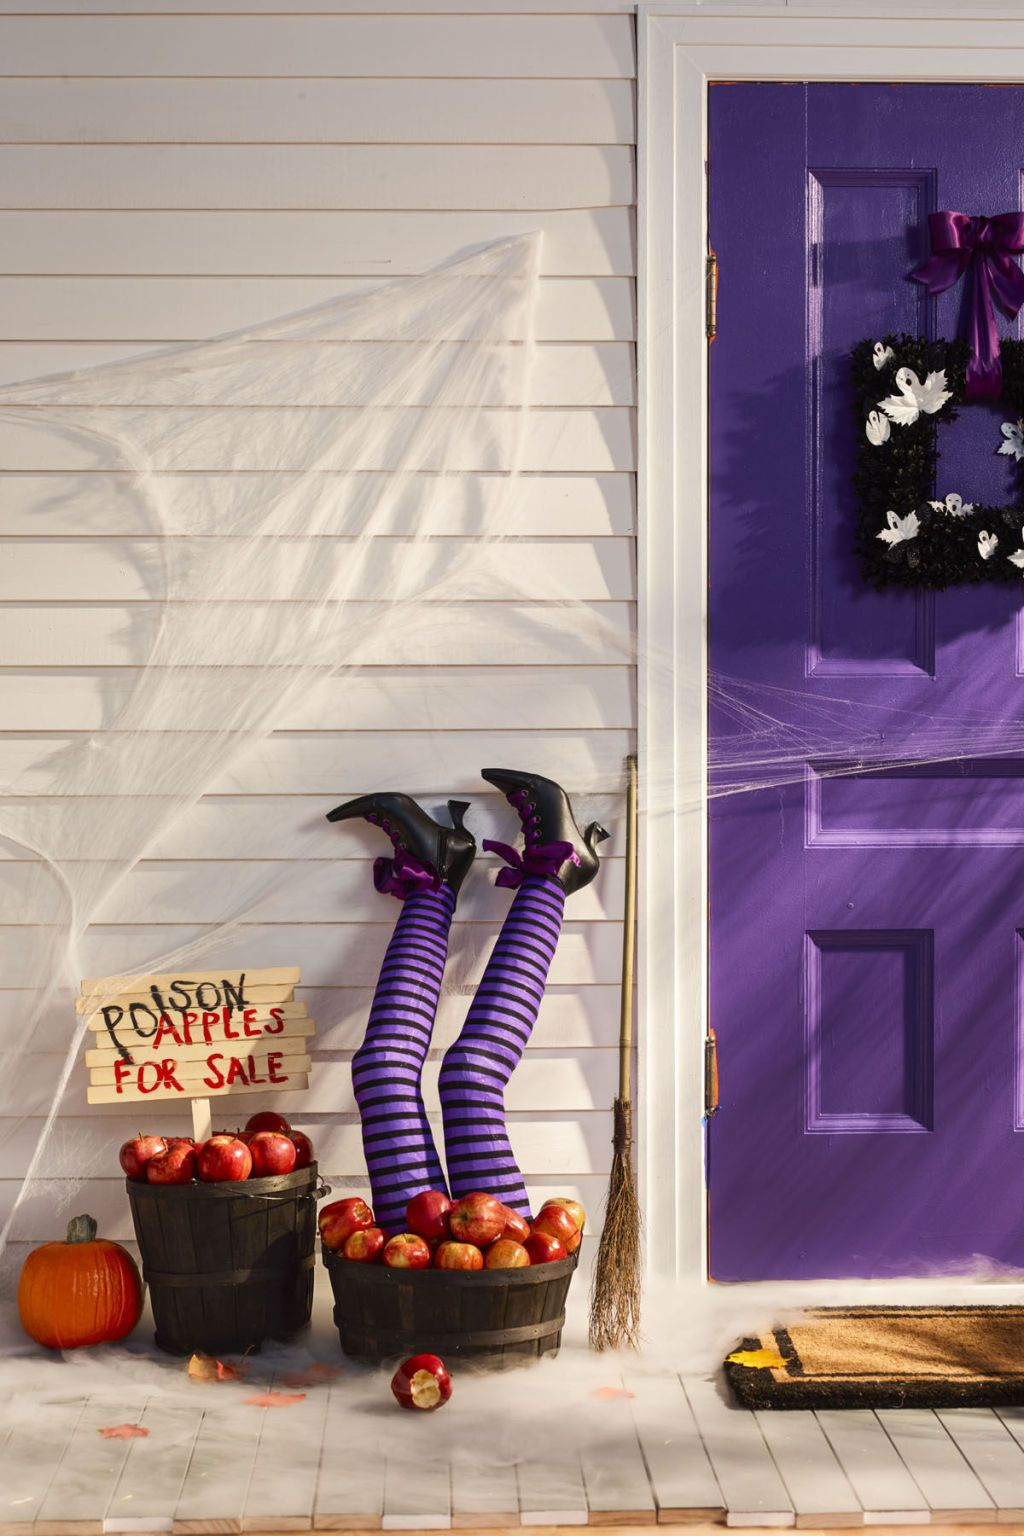 50 diy halloween decorations that 39 ll transform your home. Black Bedroom Furniture Sets. Home Design Ideas